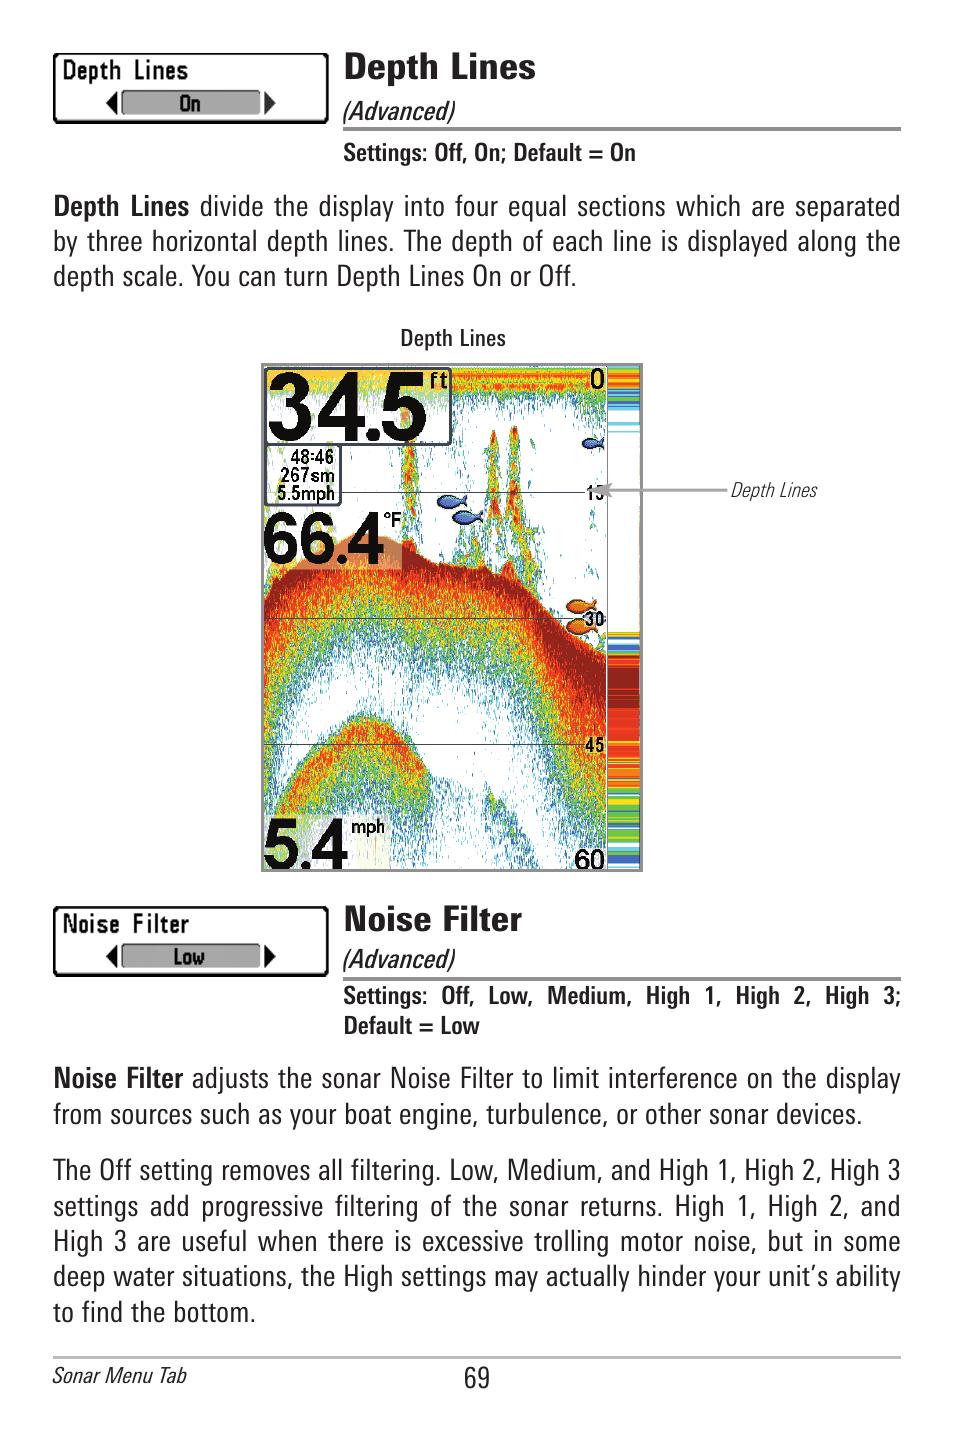 Depth lines, Noise filter | Humminbird 596C HD DI User